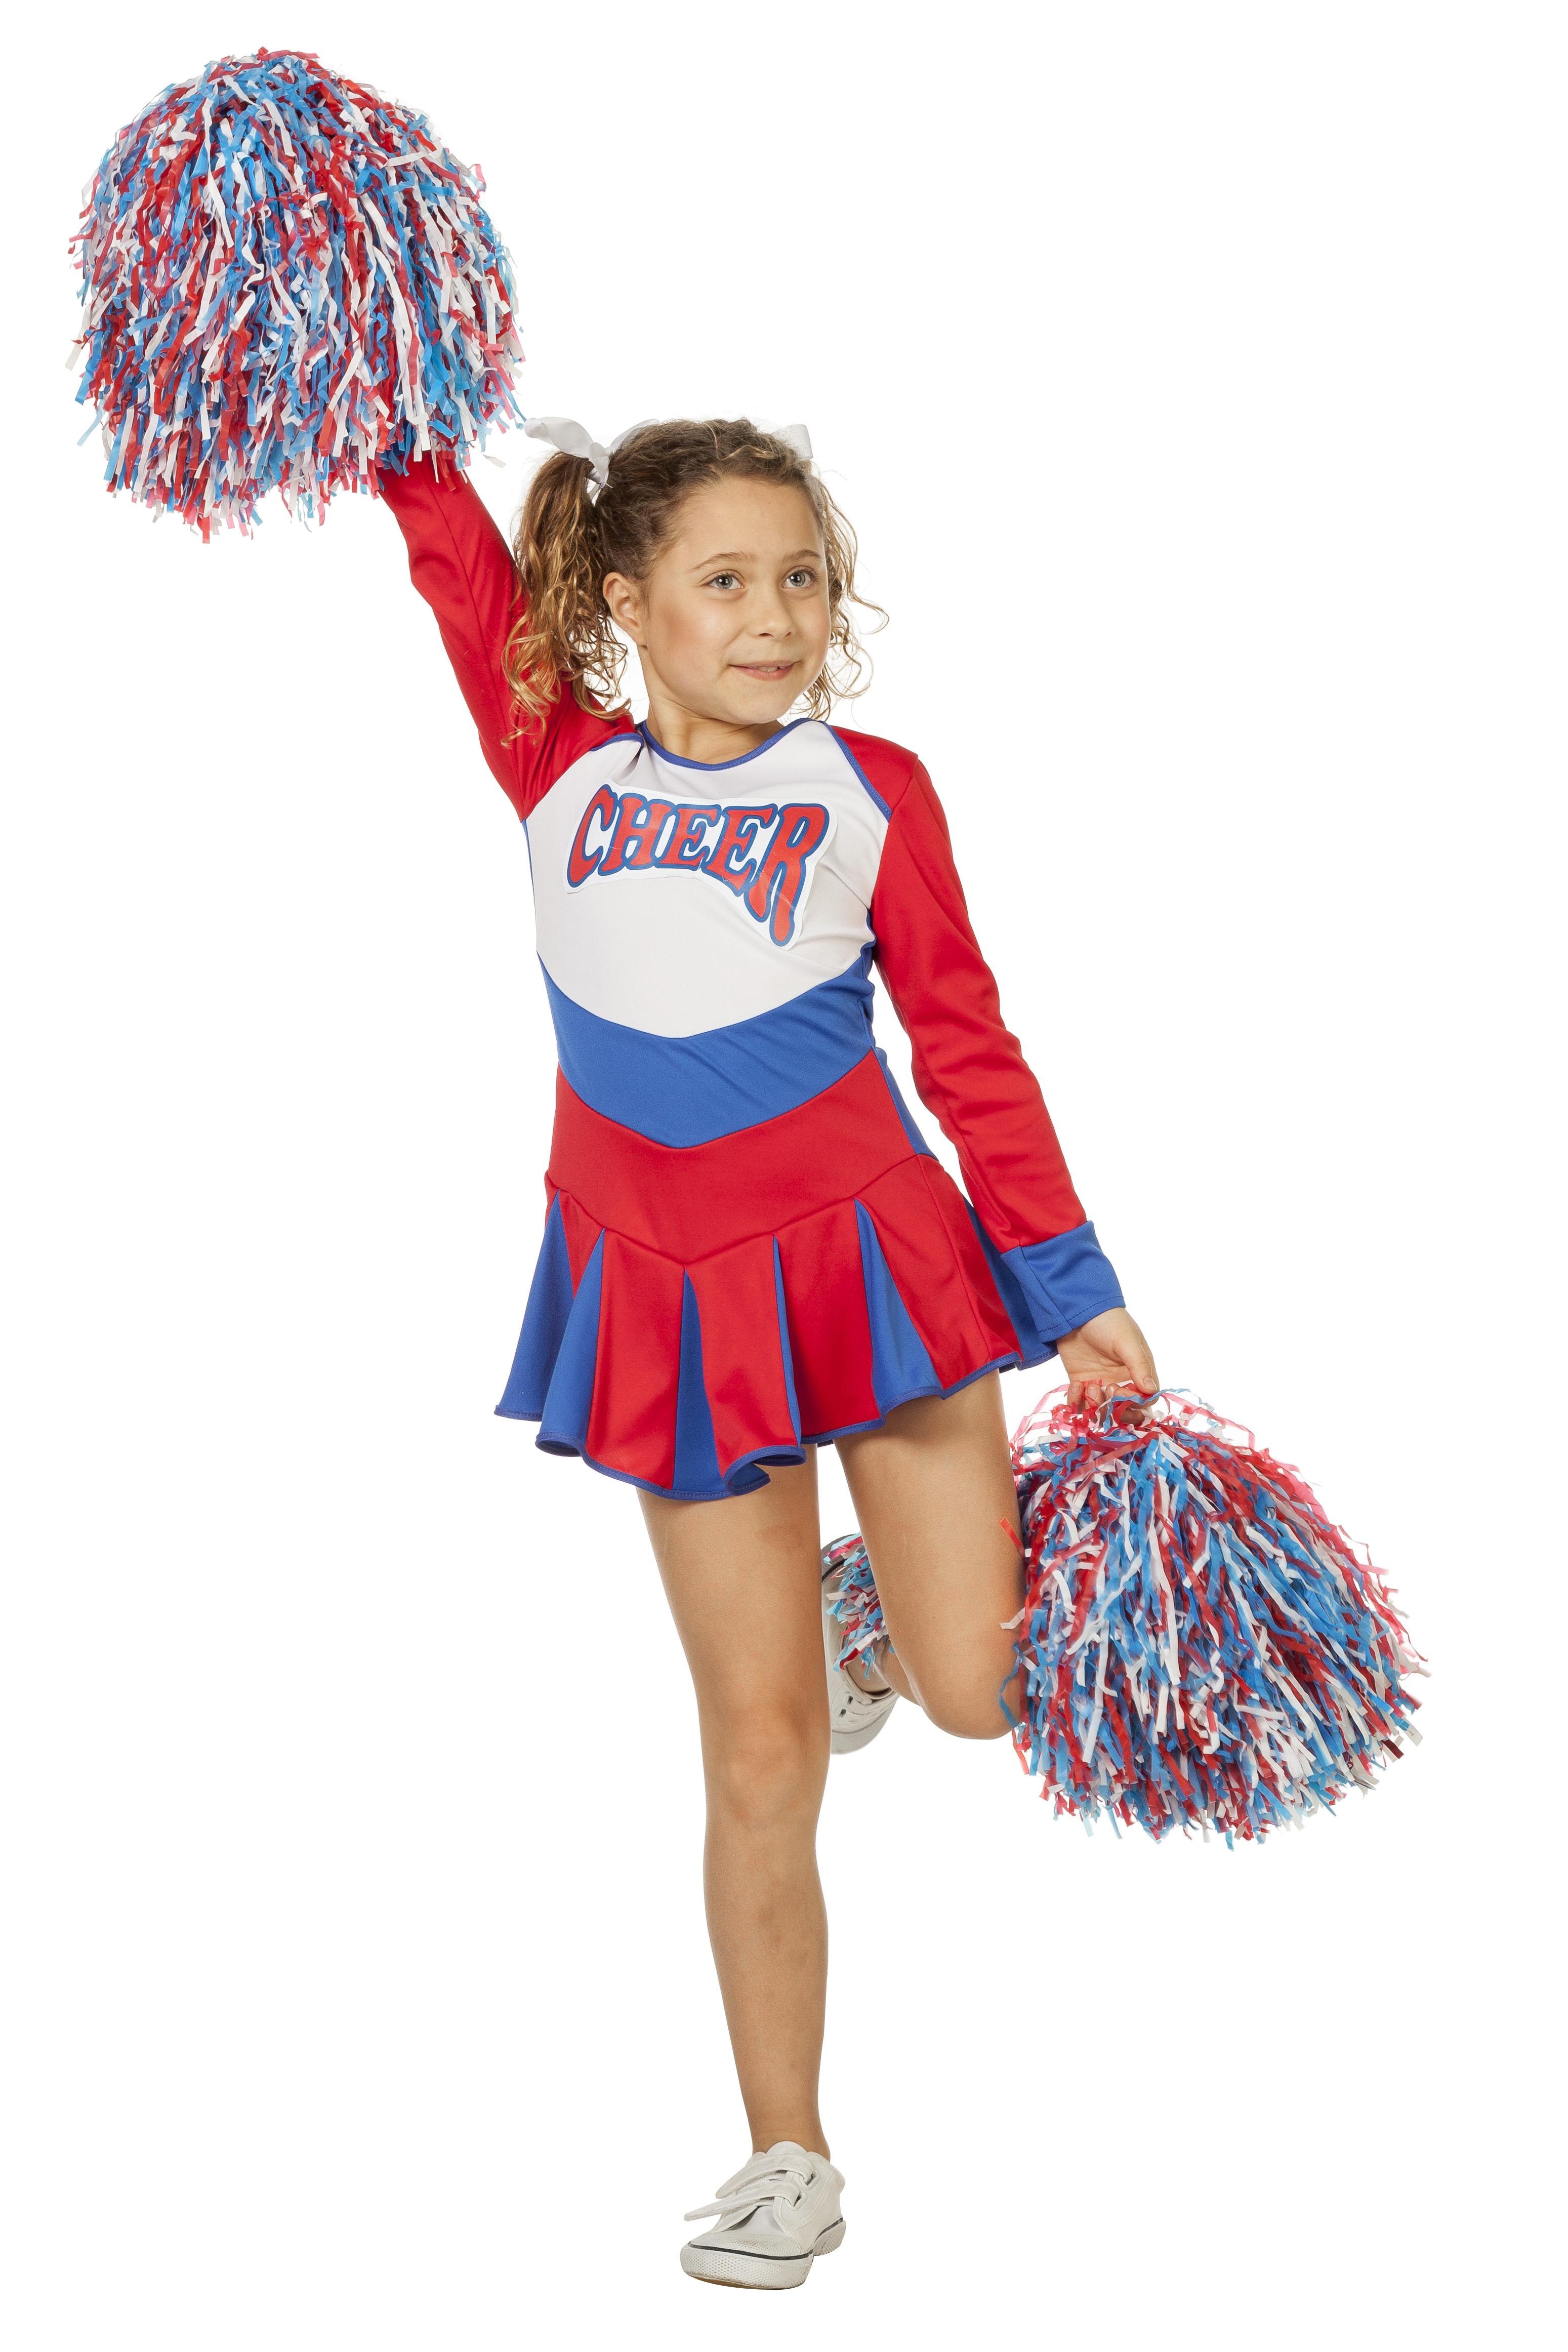 wilbers cheerleader kleid cheer leader gr e 140 cm scherzwelt. Black Bedroom Furniture Sets. Home Design Ideas